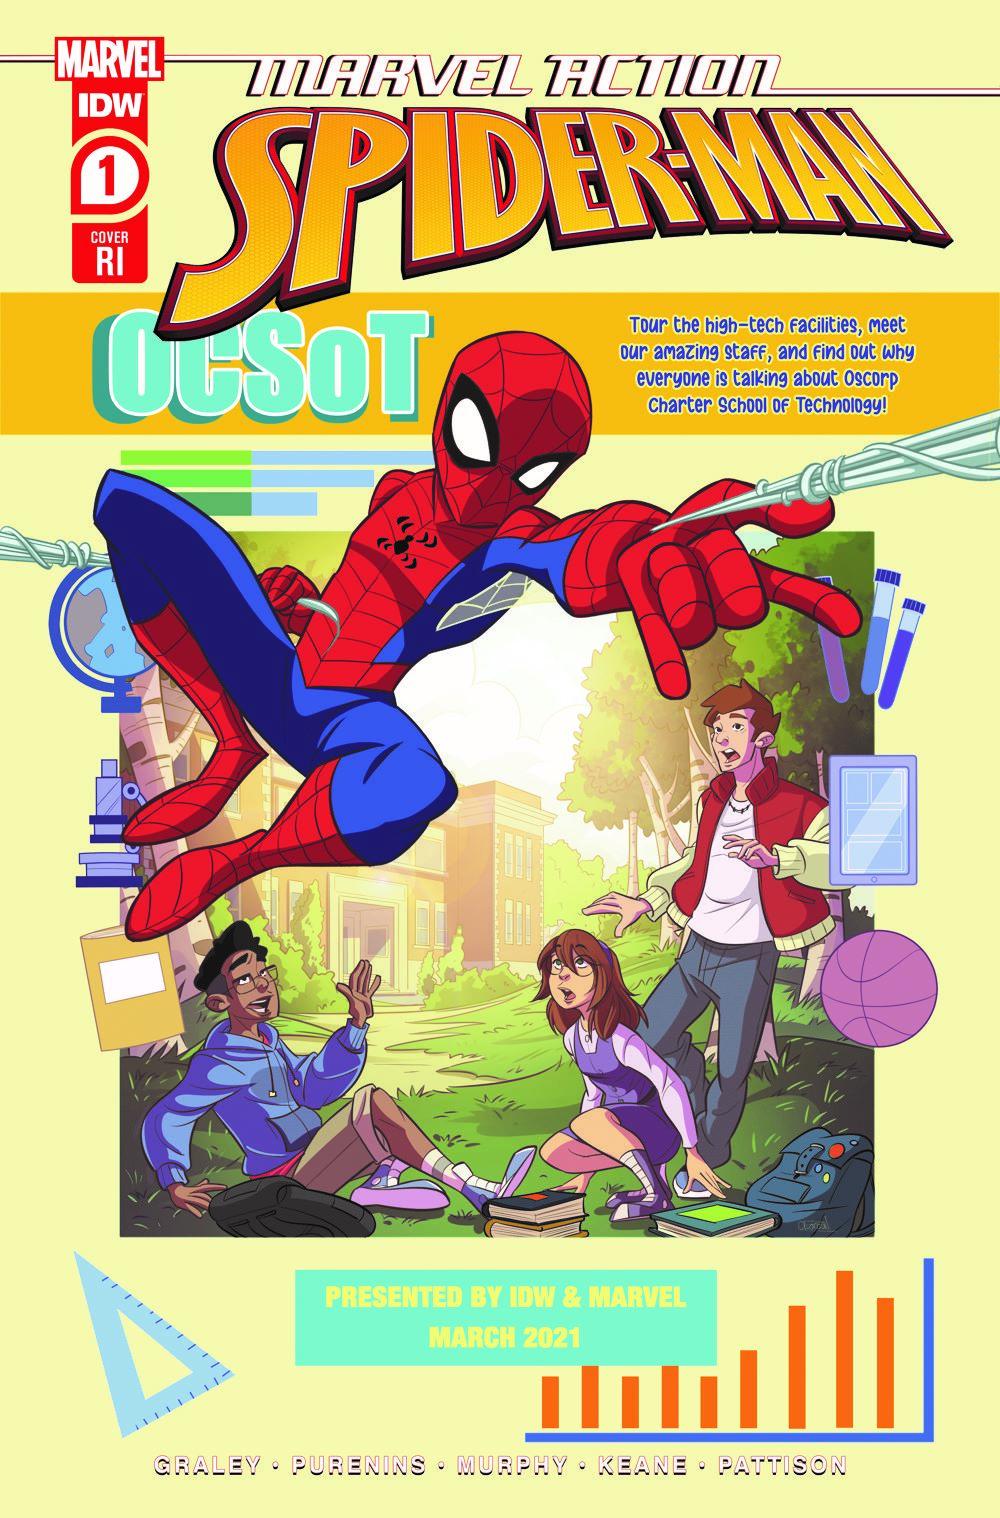 SpidermanV3-01_cvrRI ComicList Previews: MARVEL ACTION SPIDER-MAN VOLUME 3 #1